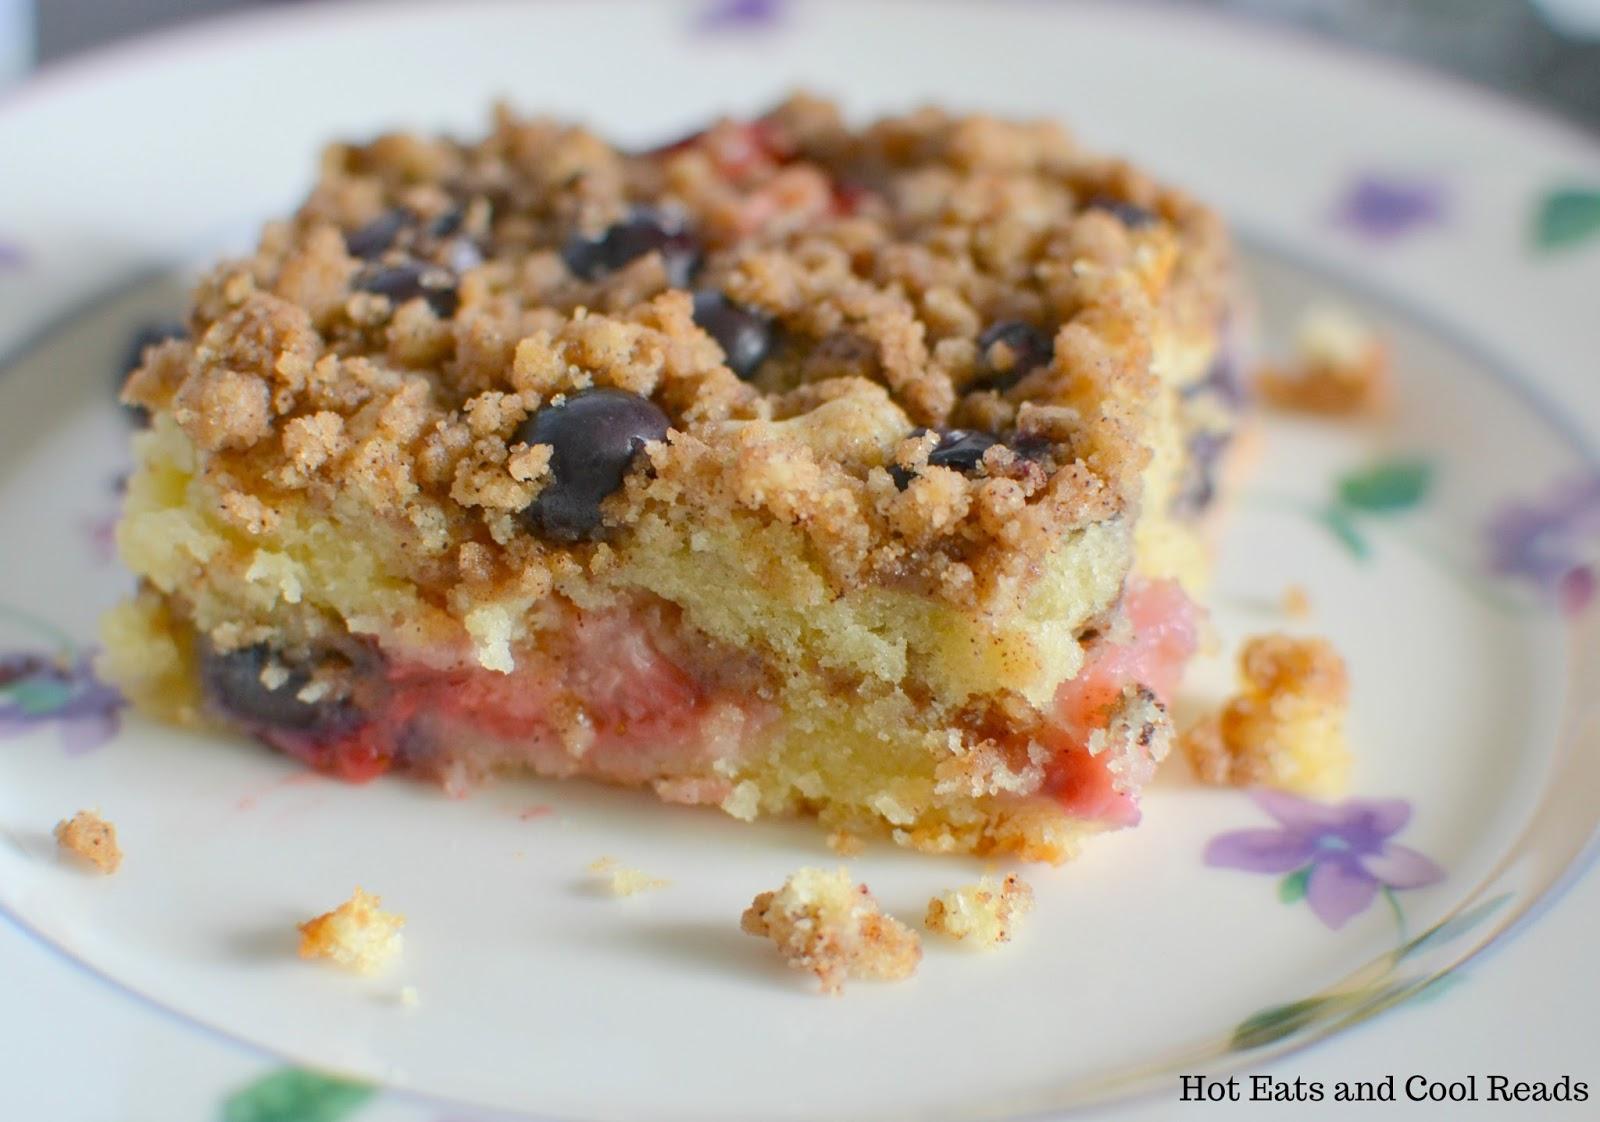 Blueberry Crunch Coffee Cake